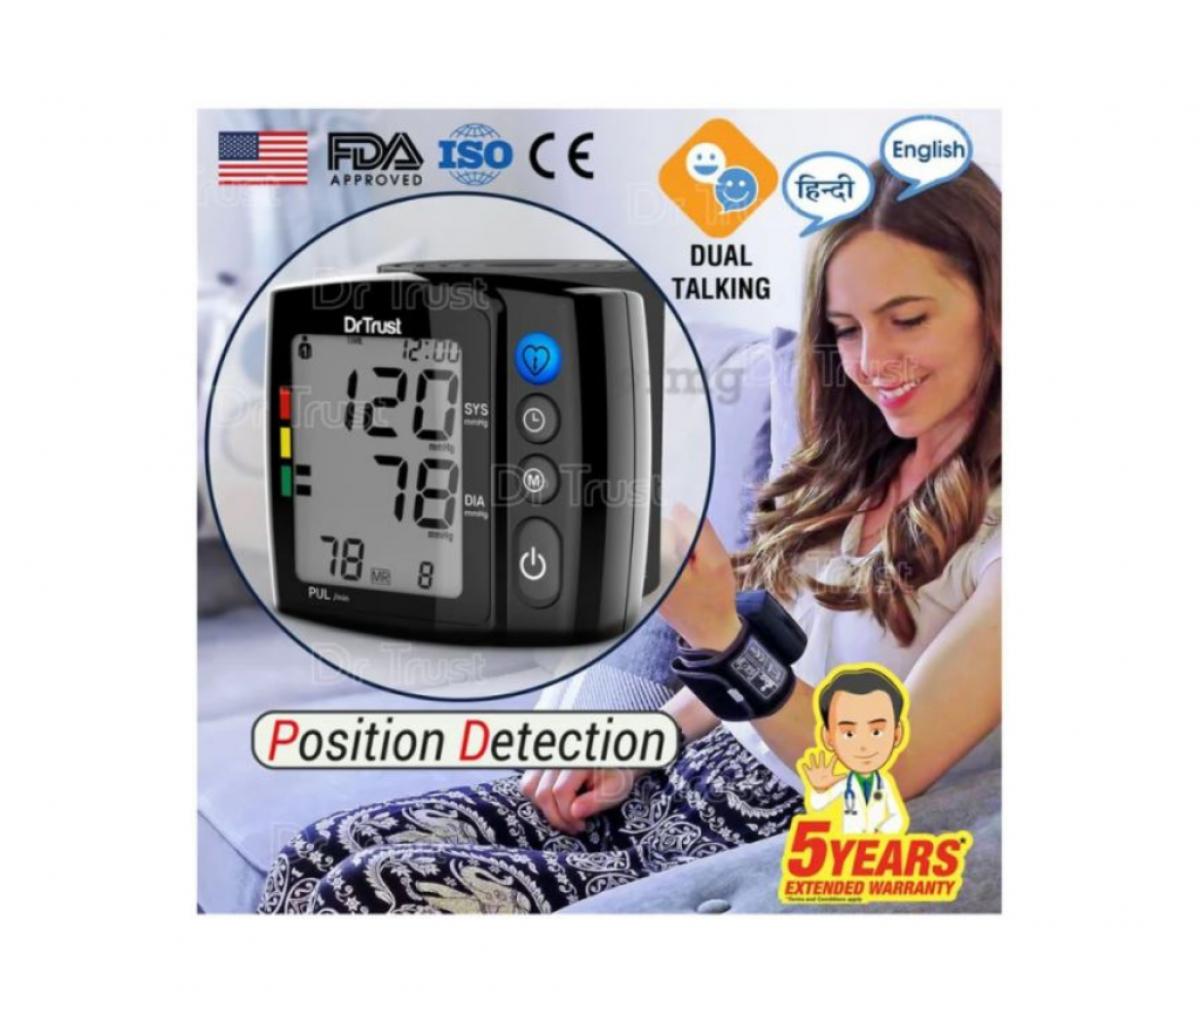 Dr Trust USA Wrist Fully Automatic Digital Blood Pressure Monitor Black